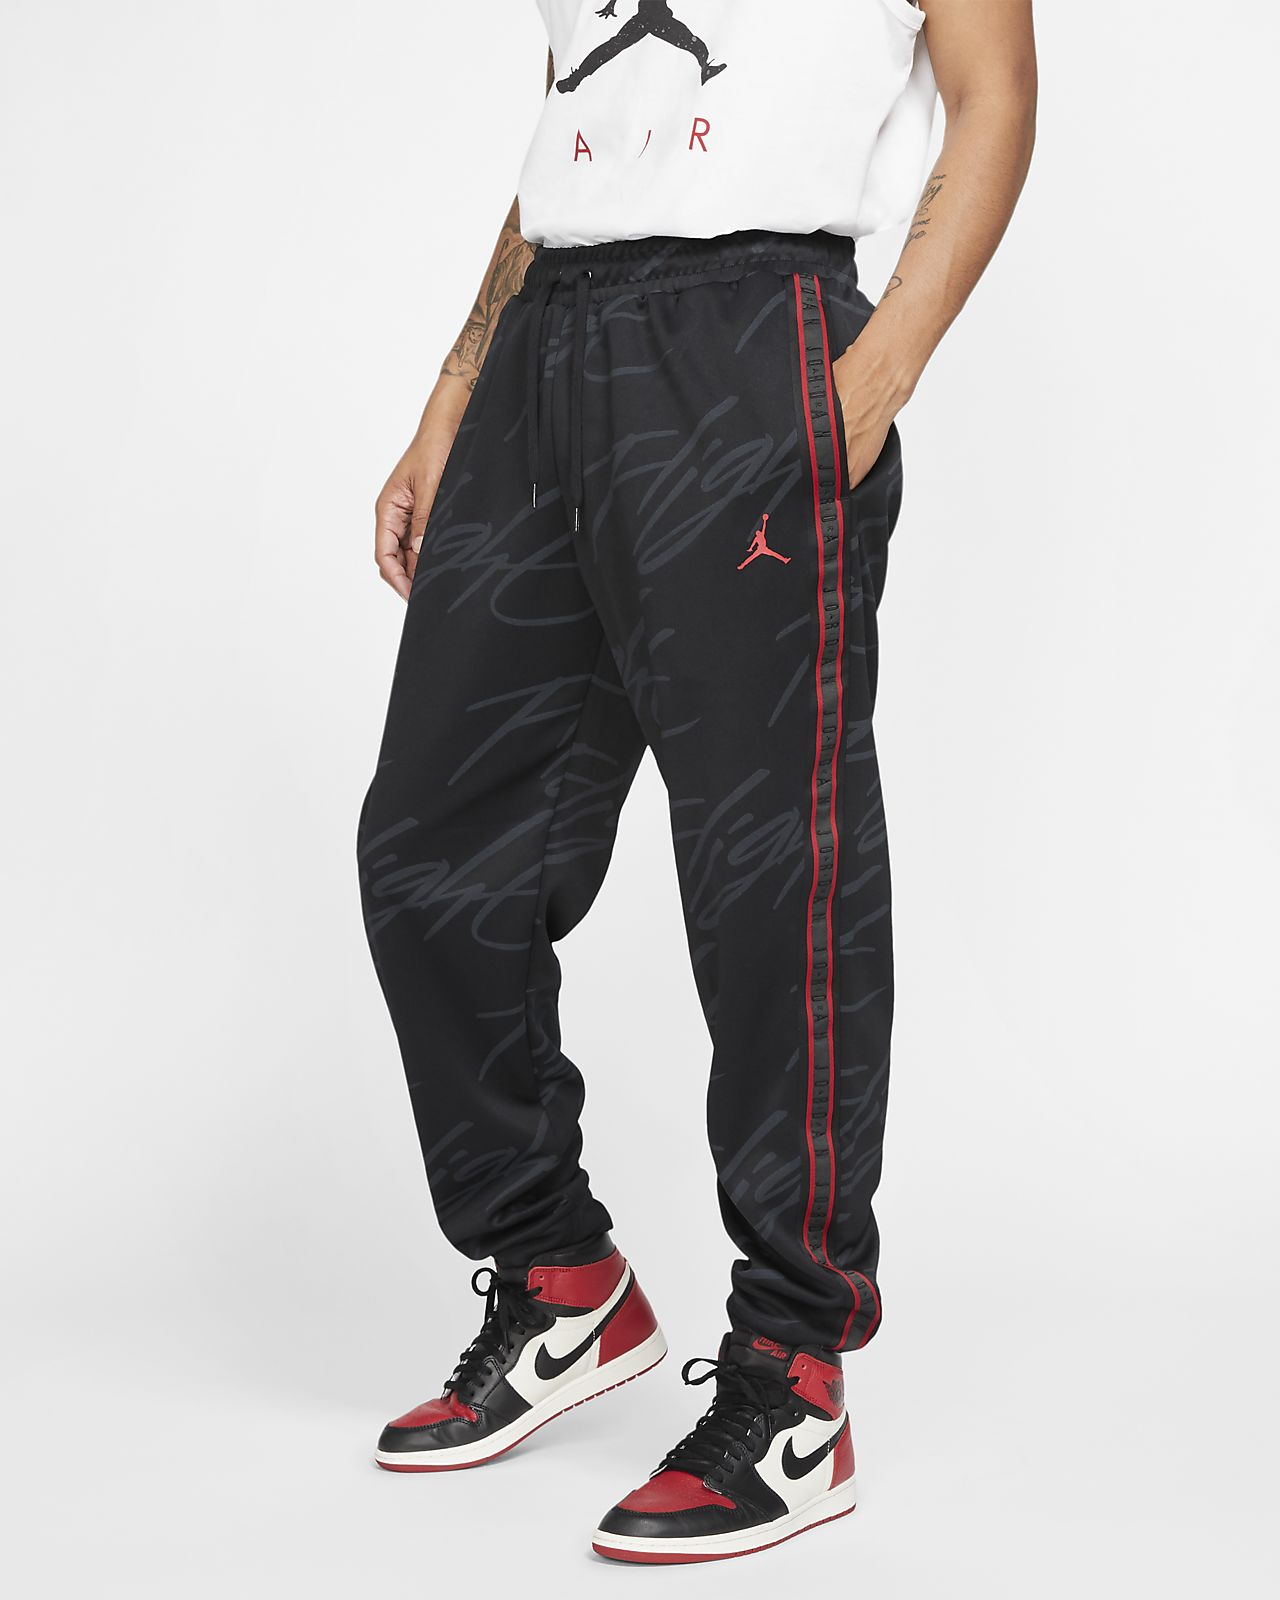 9292d4b8e8e Low Resolution Jordan Jumpman Tricot Graphic Pants Jordan Jumpman Tricot  Graphic Pants